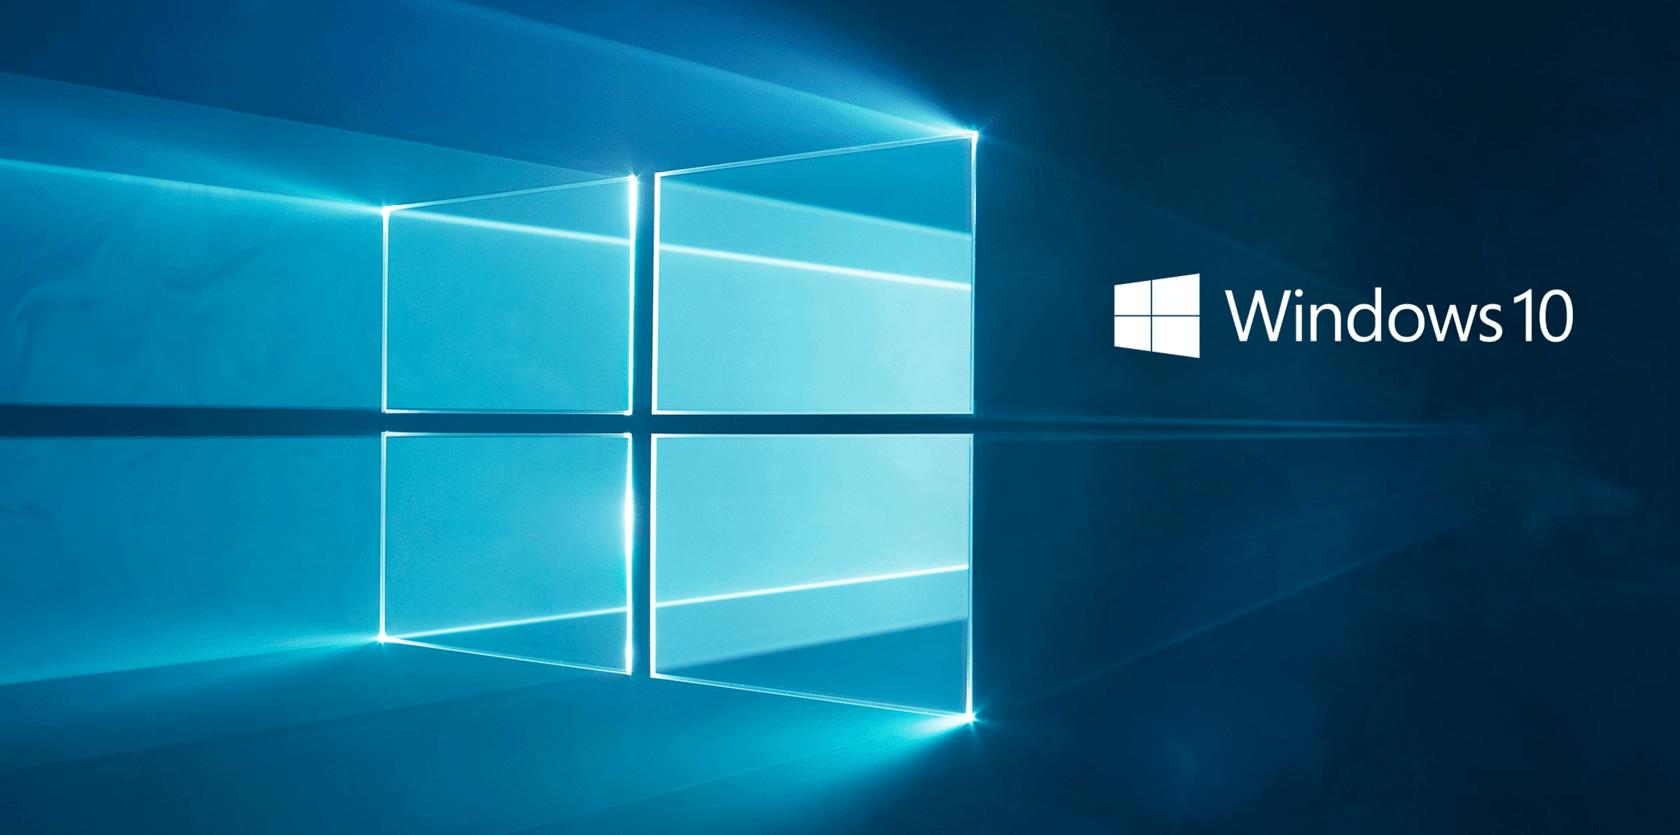 windows 10 logo tekst - Windows 10 Fall Creators Update: como atualizar seu PC hoje